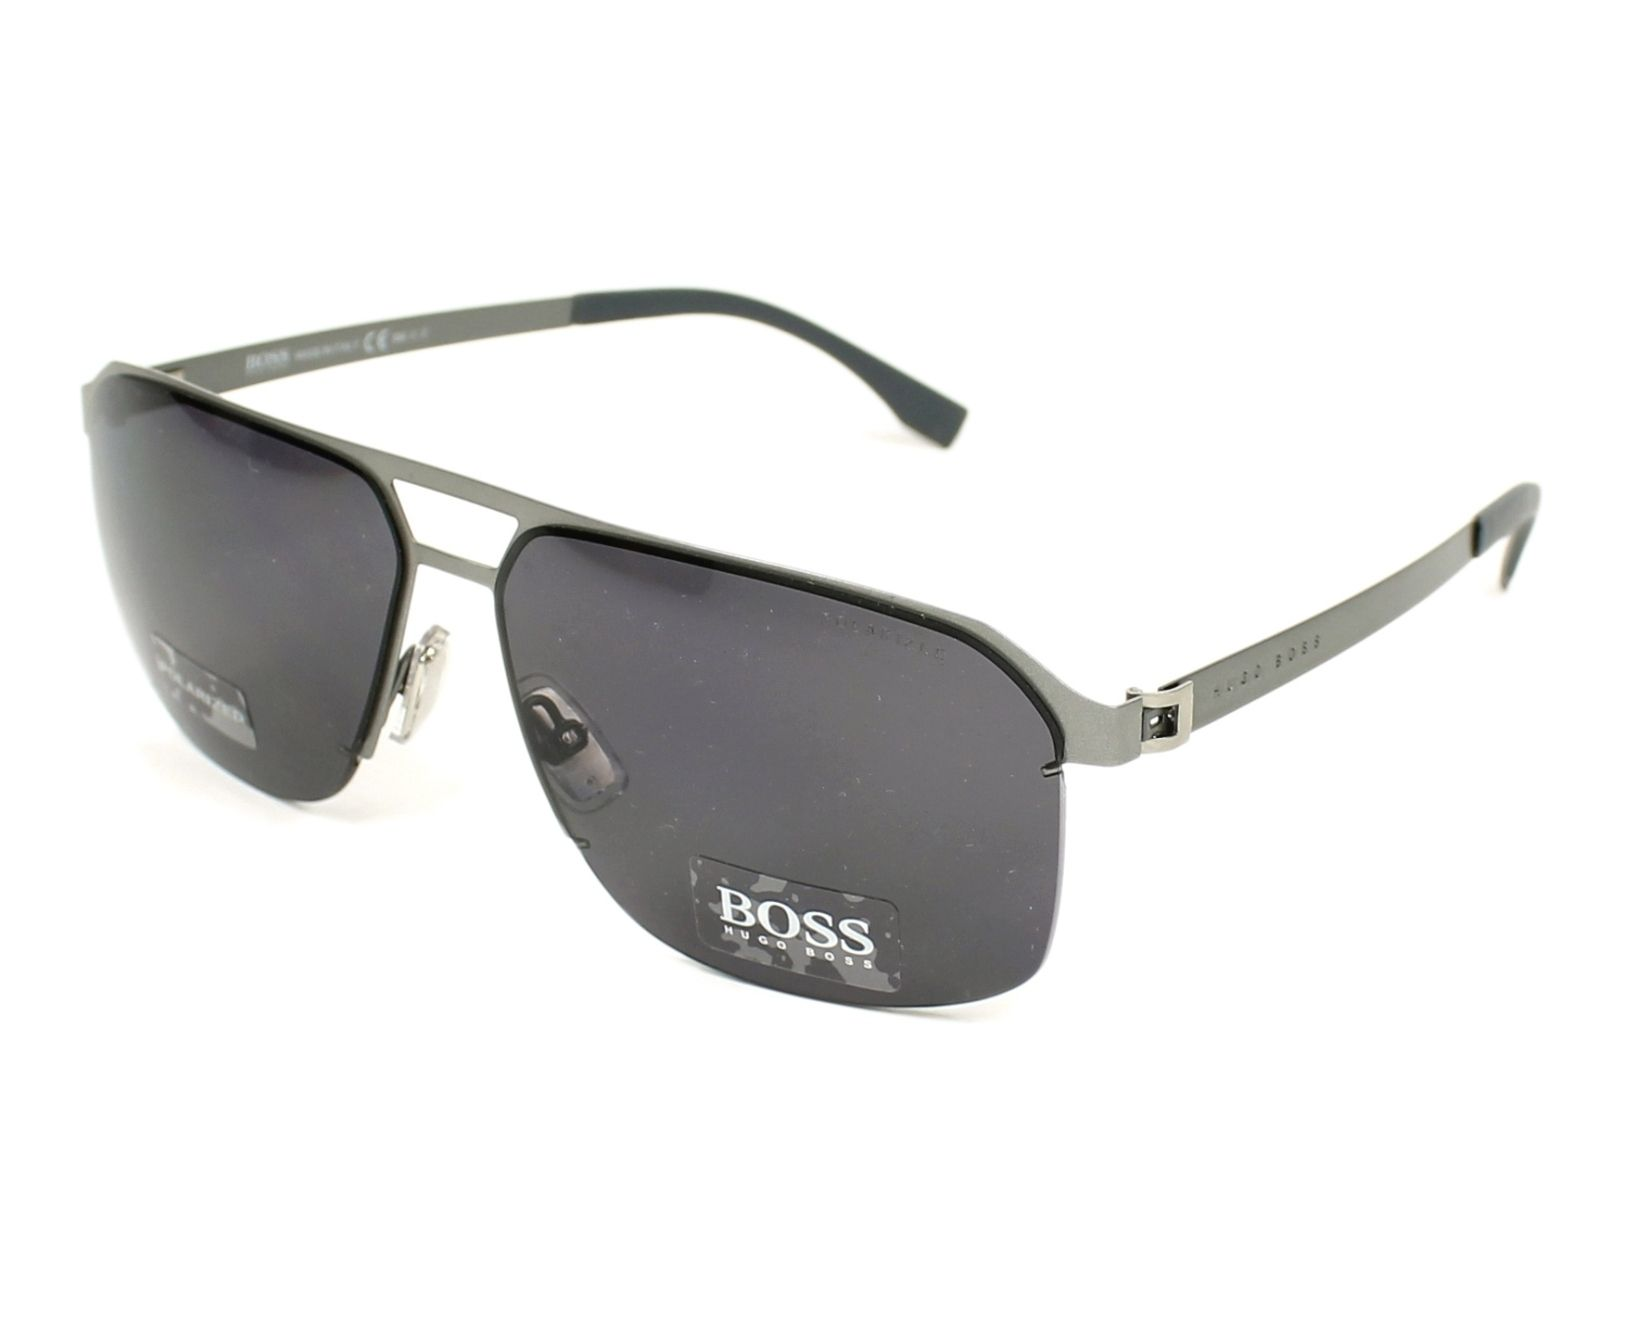 f9ef3aa7e8faf Sunglasses Hugo Boss BOSS-0839-S R81 3H 61-14 Gun profile